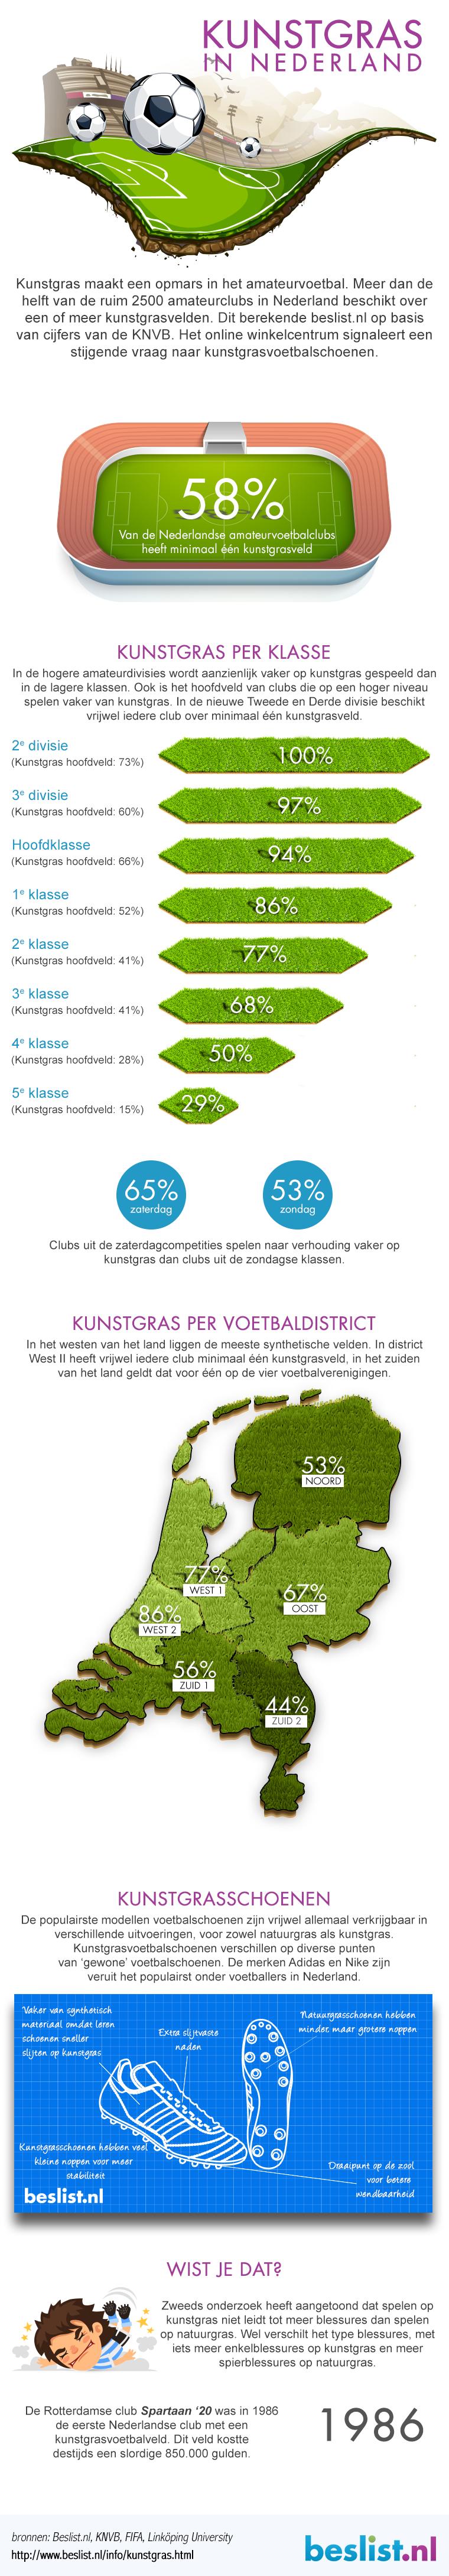 kunstgras-infographic